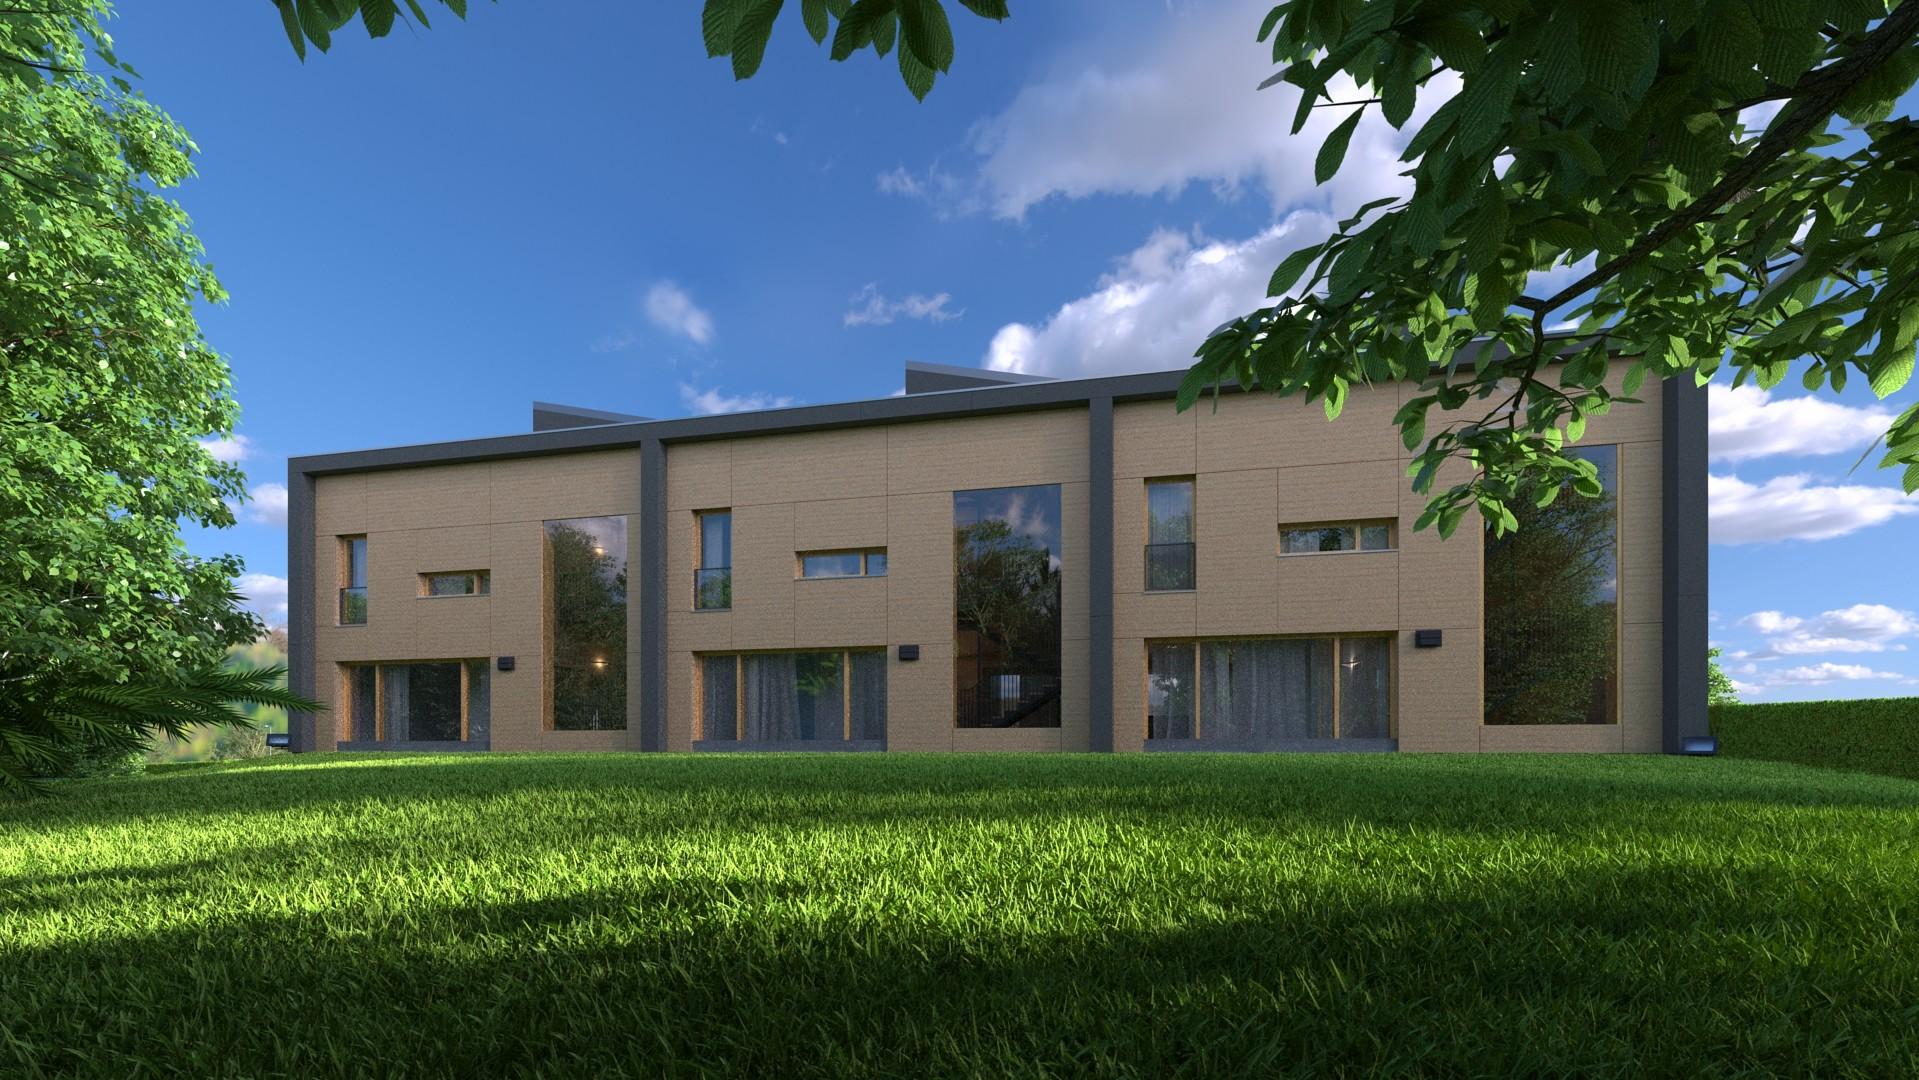 Duane kemp architect braa geneva unbiased tr1 screenshot 02